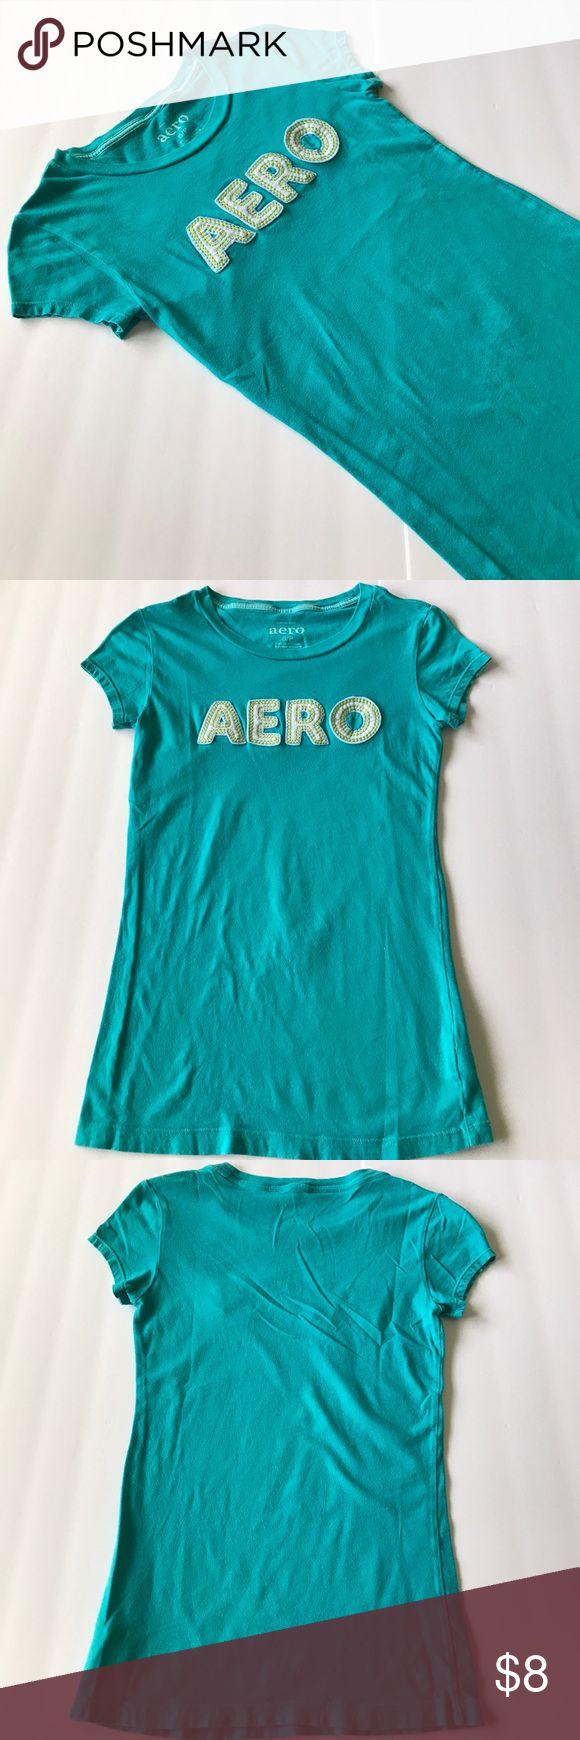 Aeropostale shirt size S Aqua blue graphic tshirt, some pilling Aeropostale Tops Tees - Short Sleeve